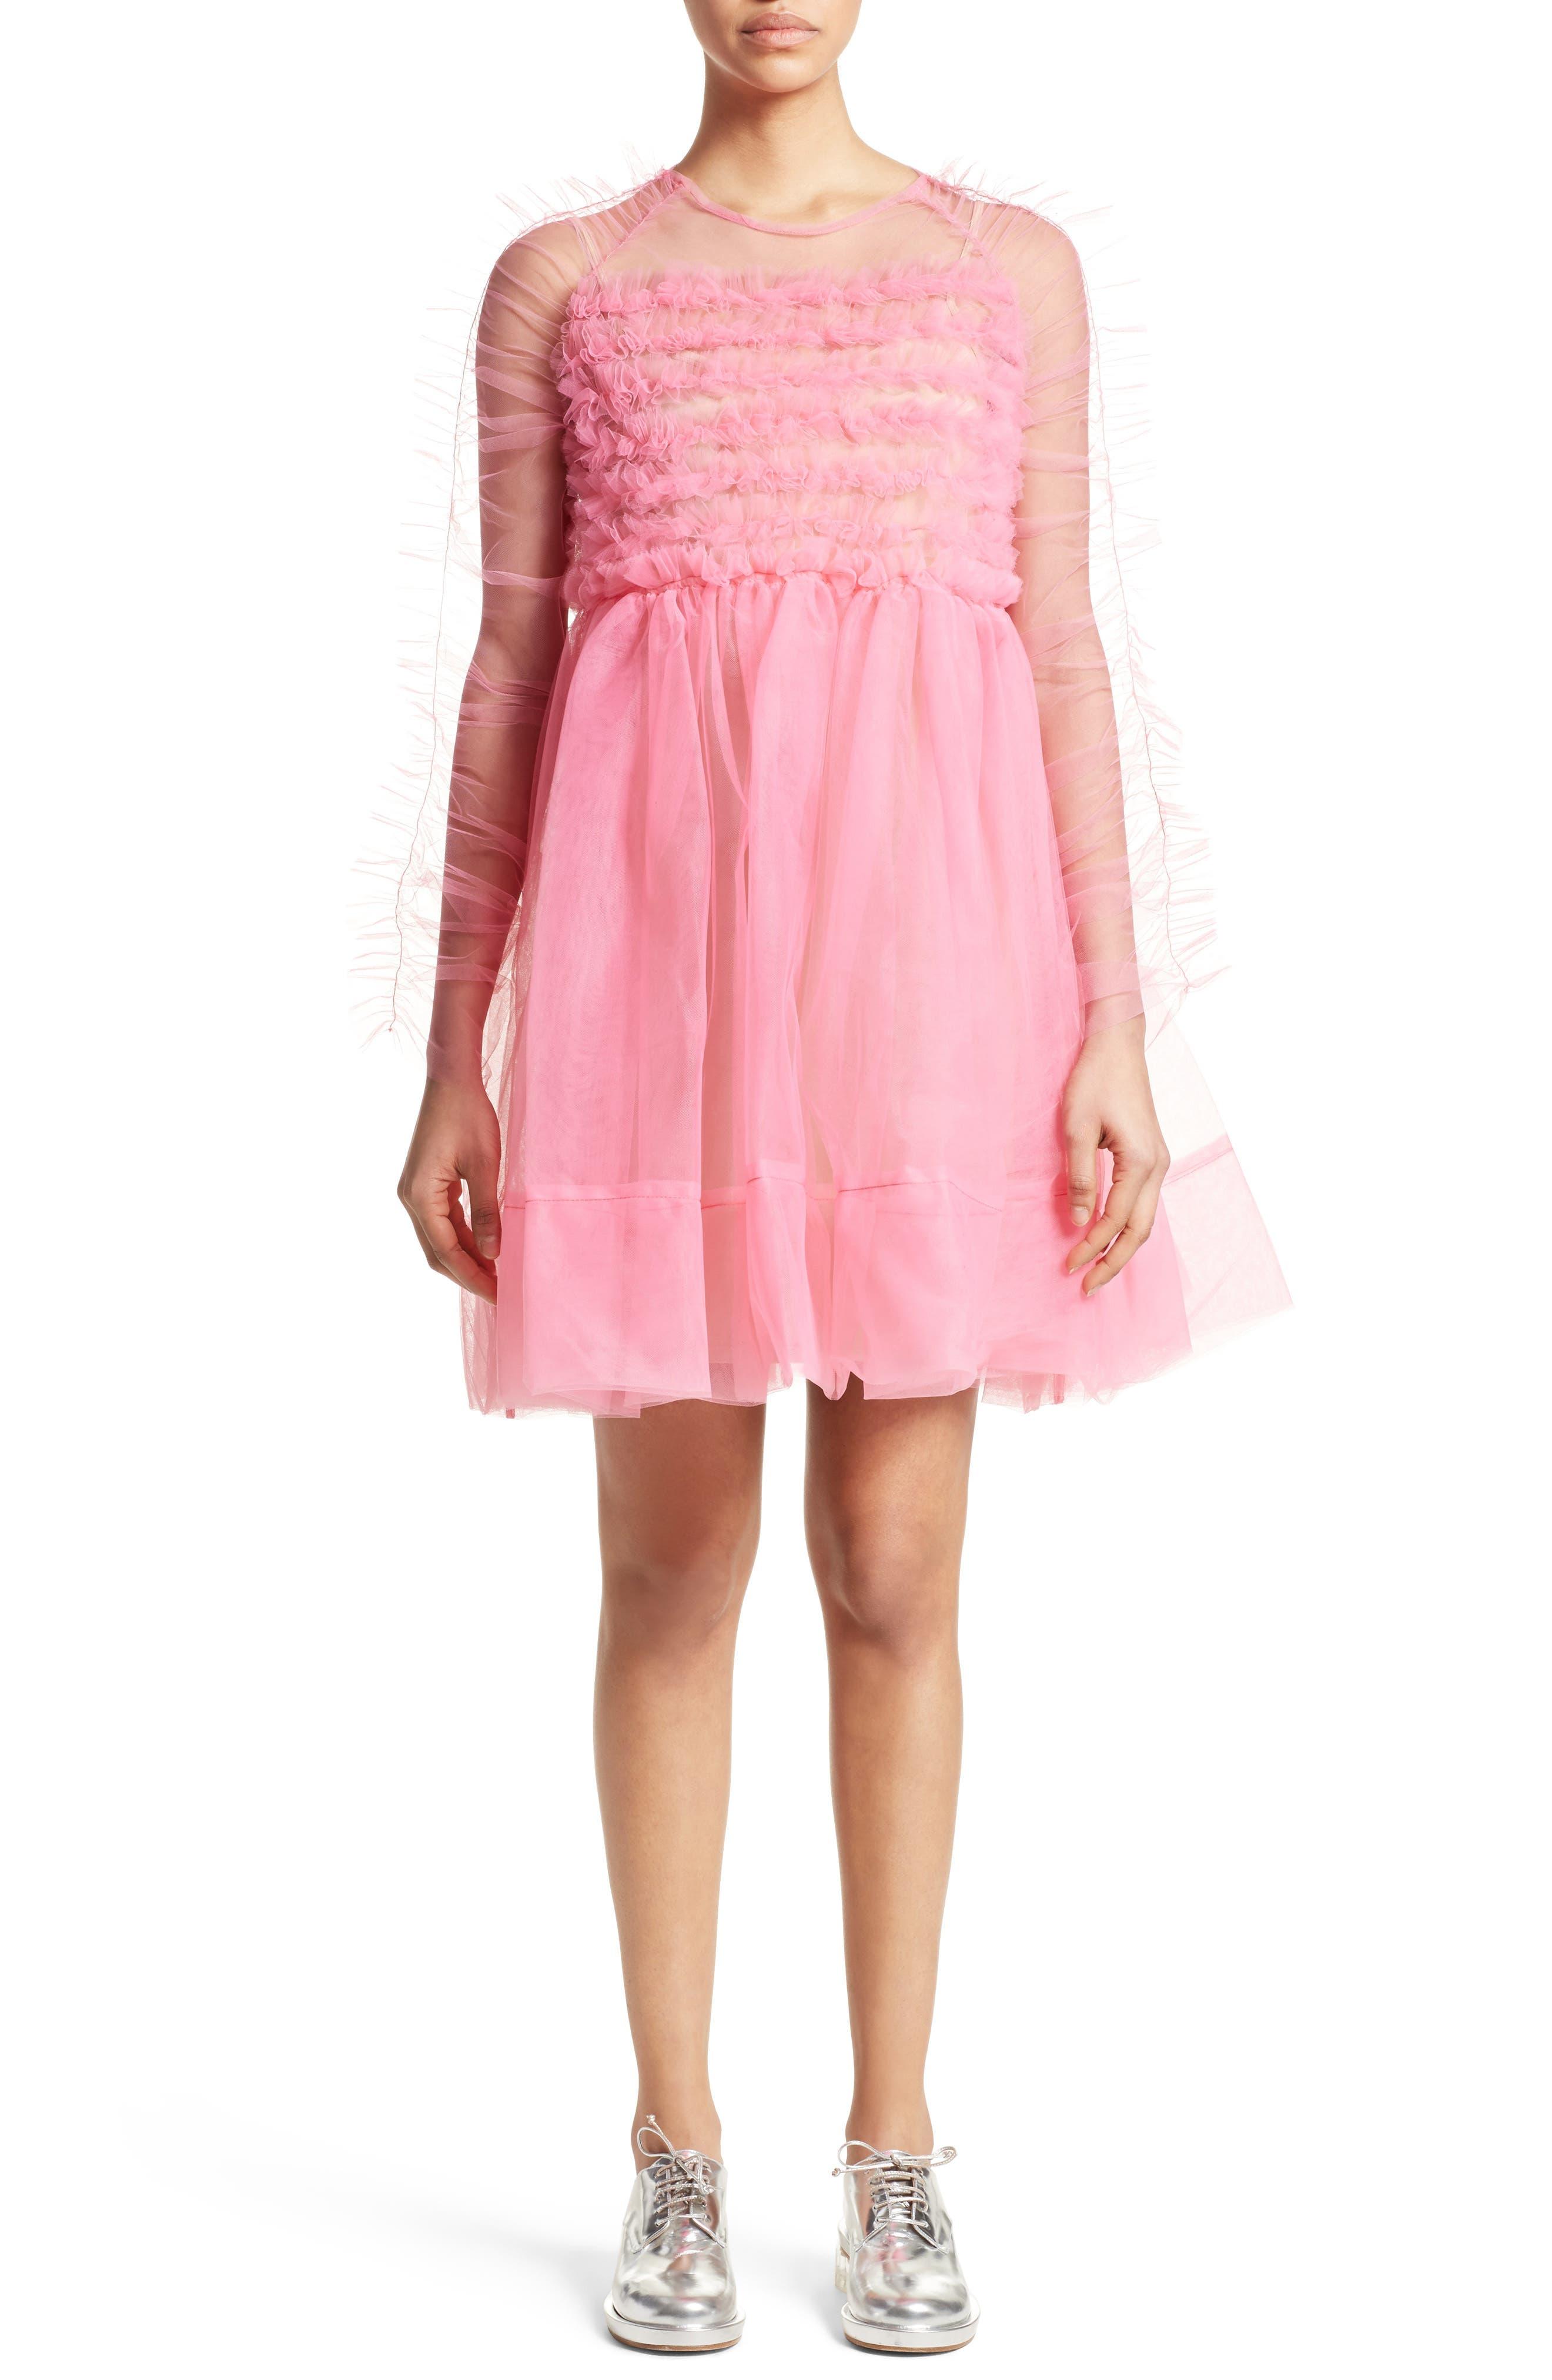 Main Image - Molly Goddard Funky Tulle Dress